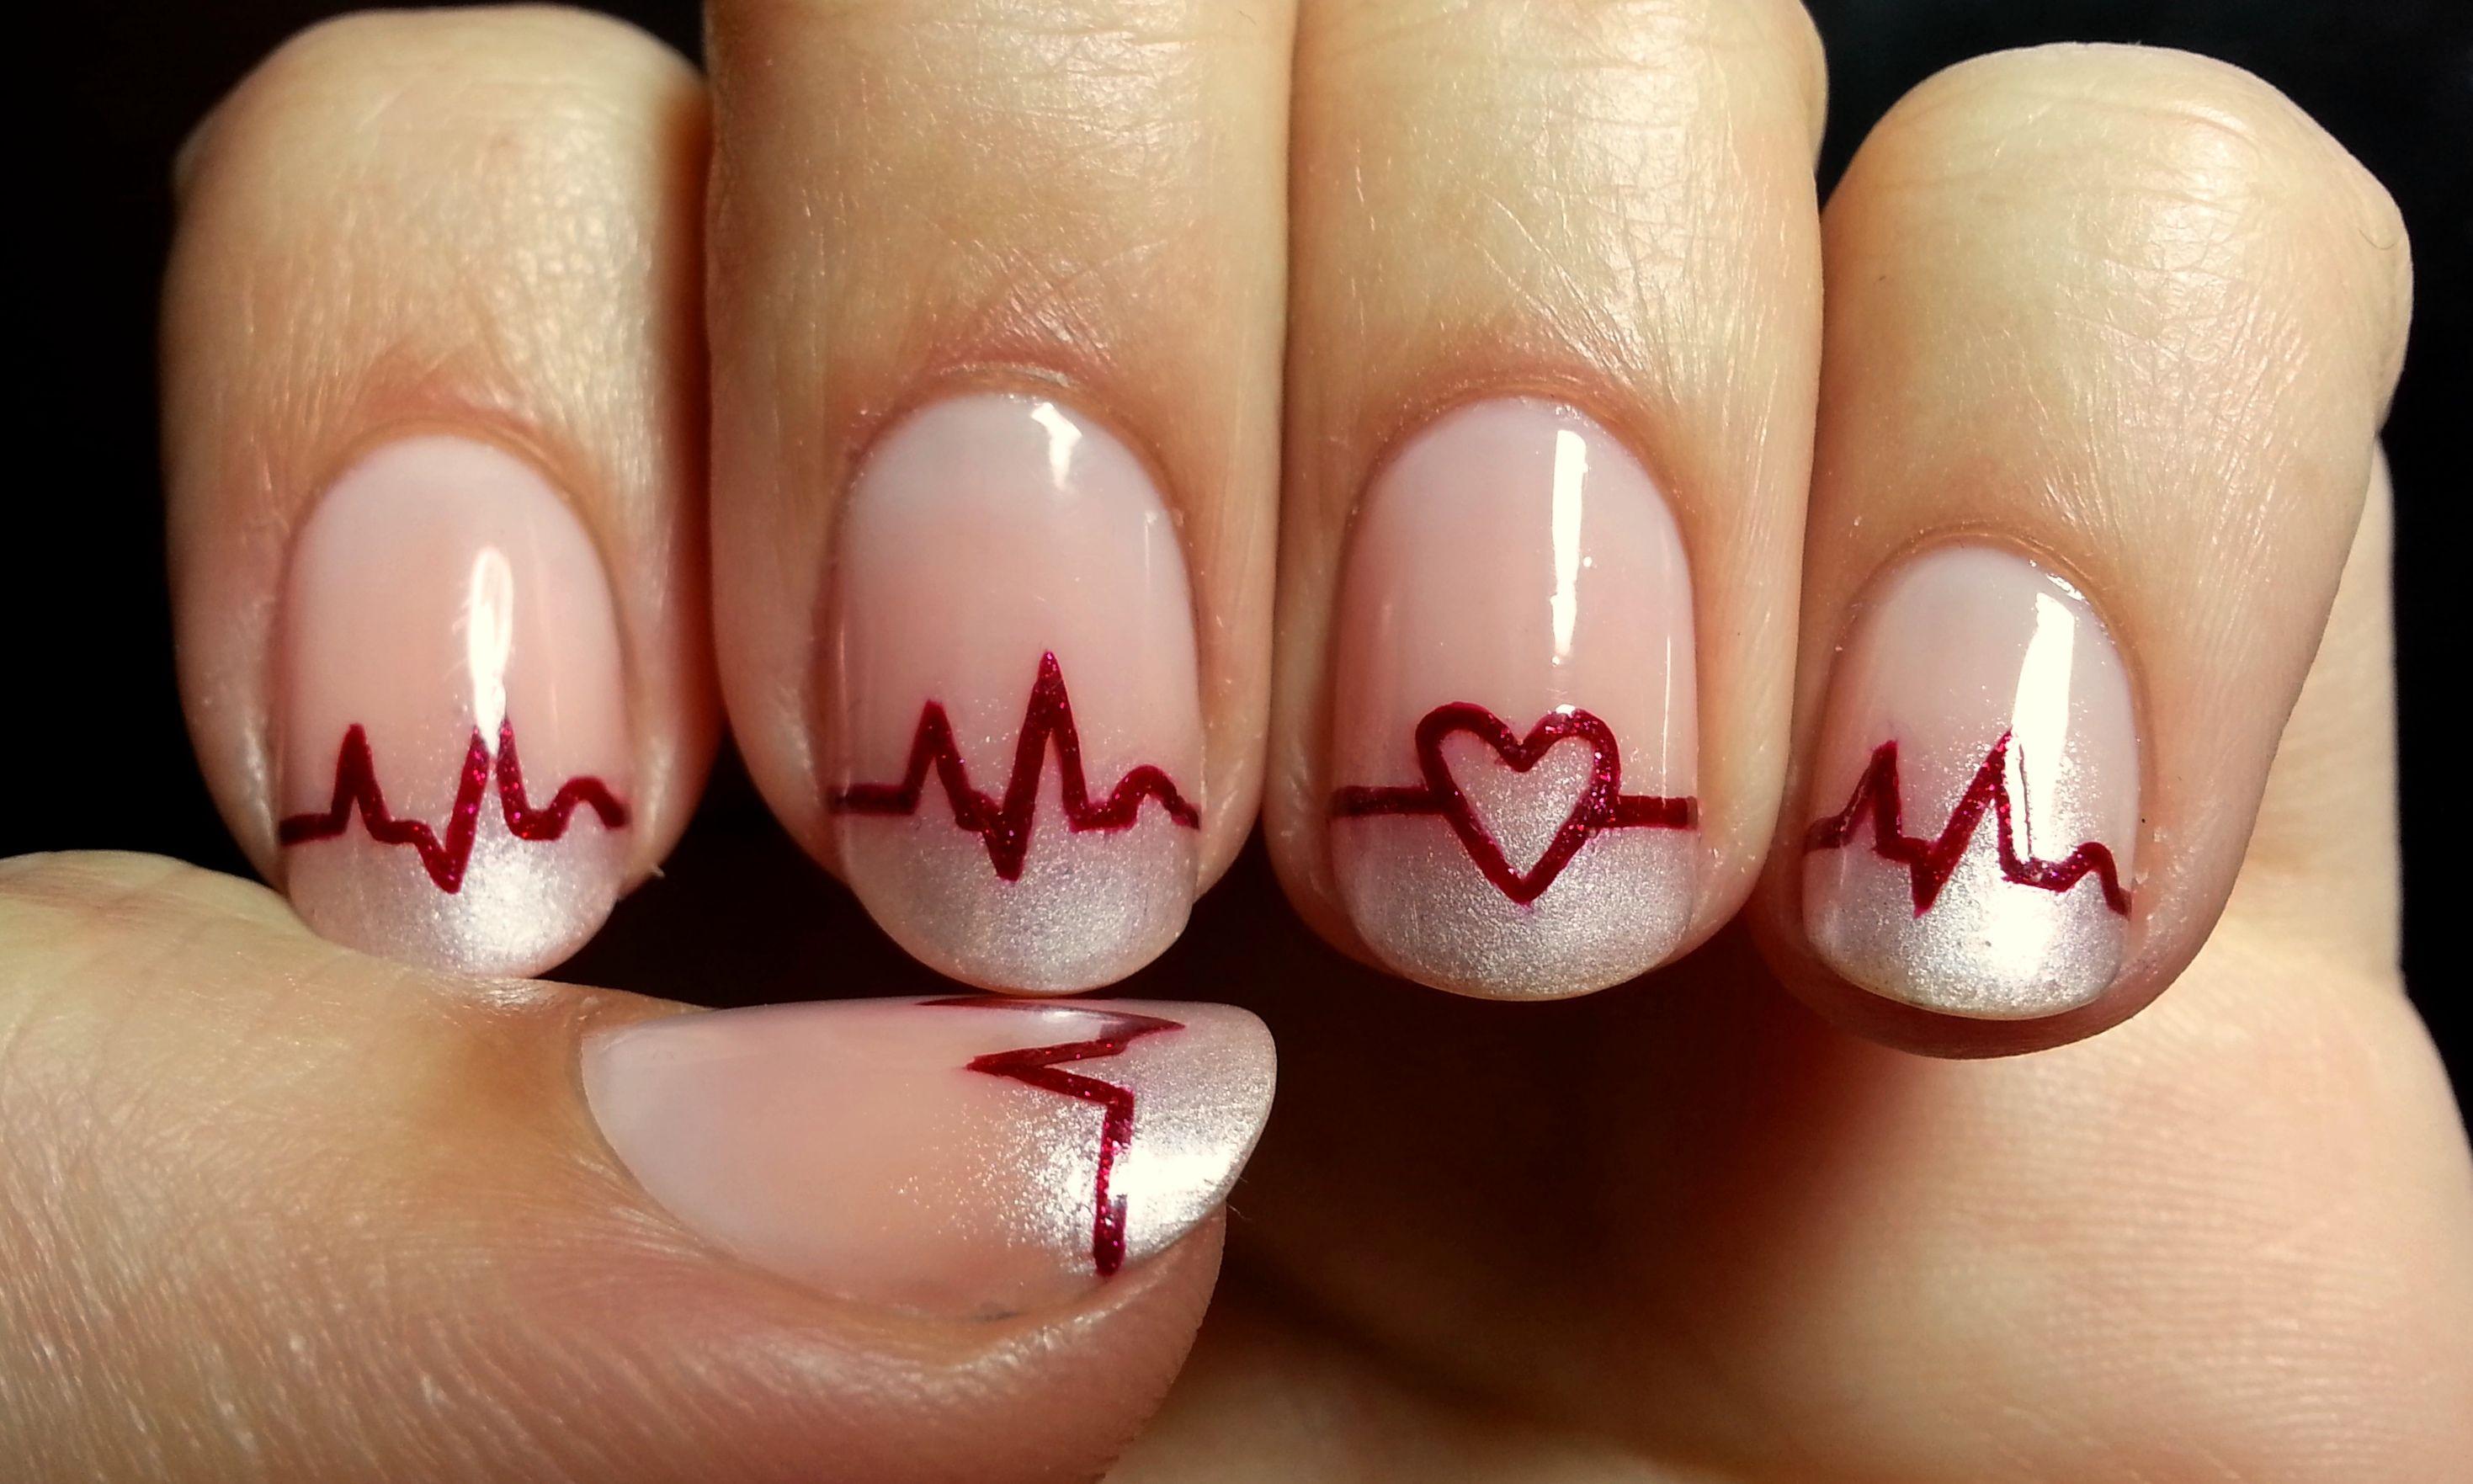 Inspiration for international nurse day | Nails | Pinterest ...